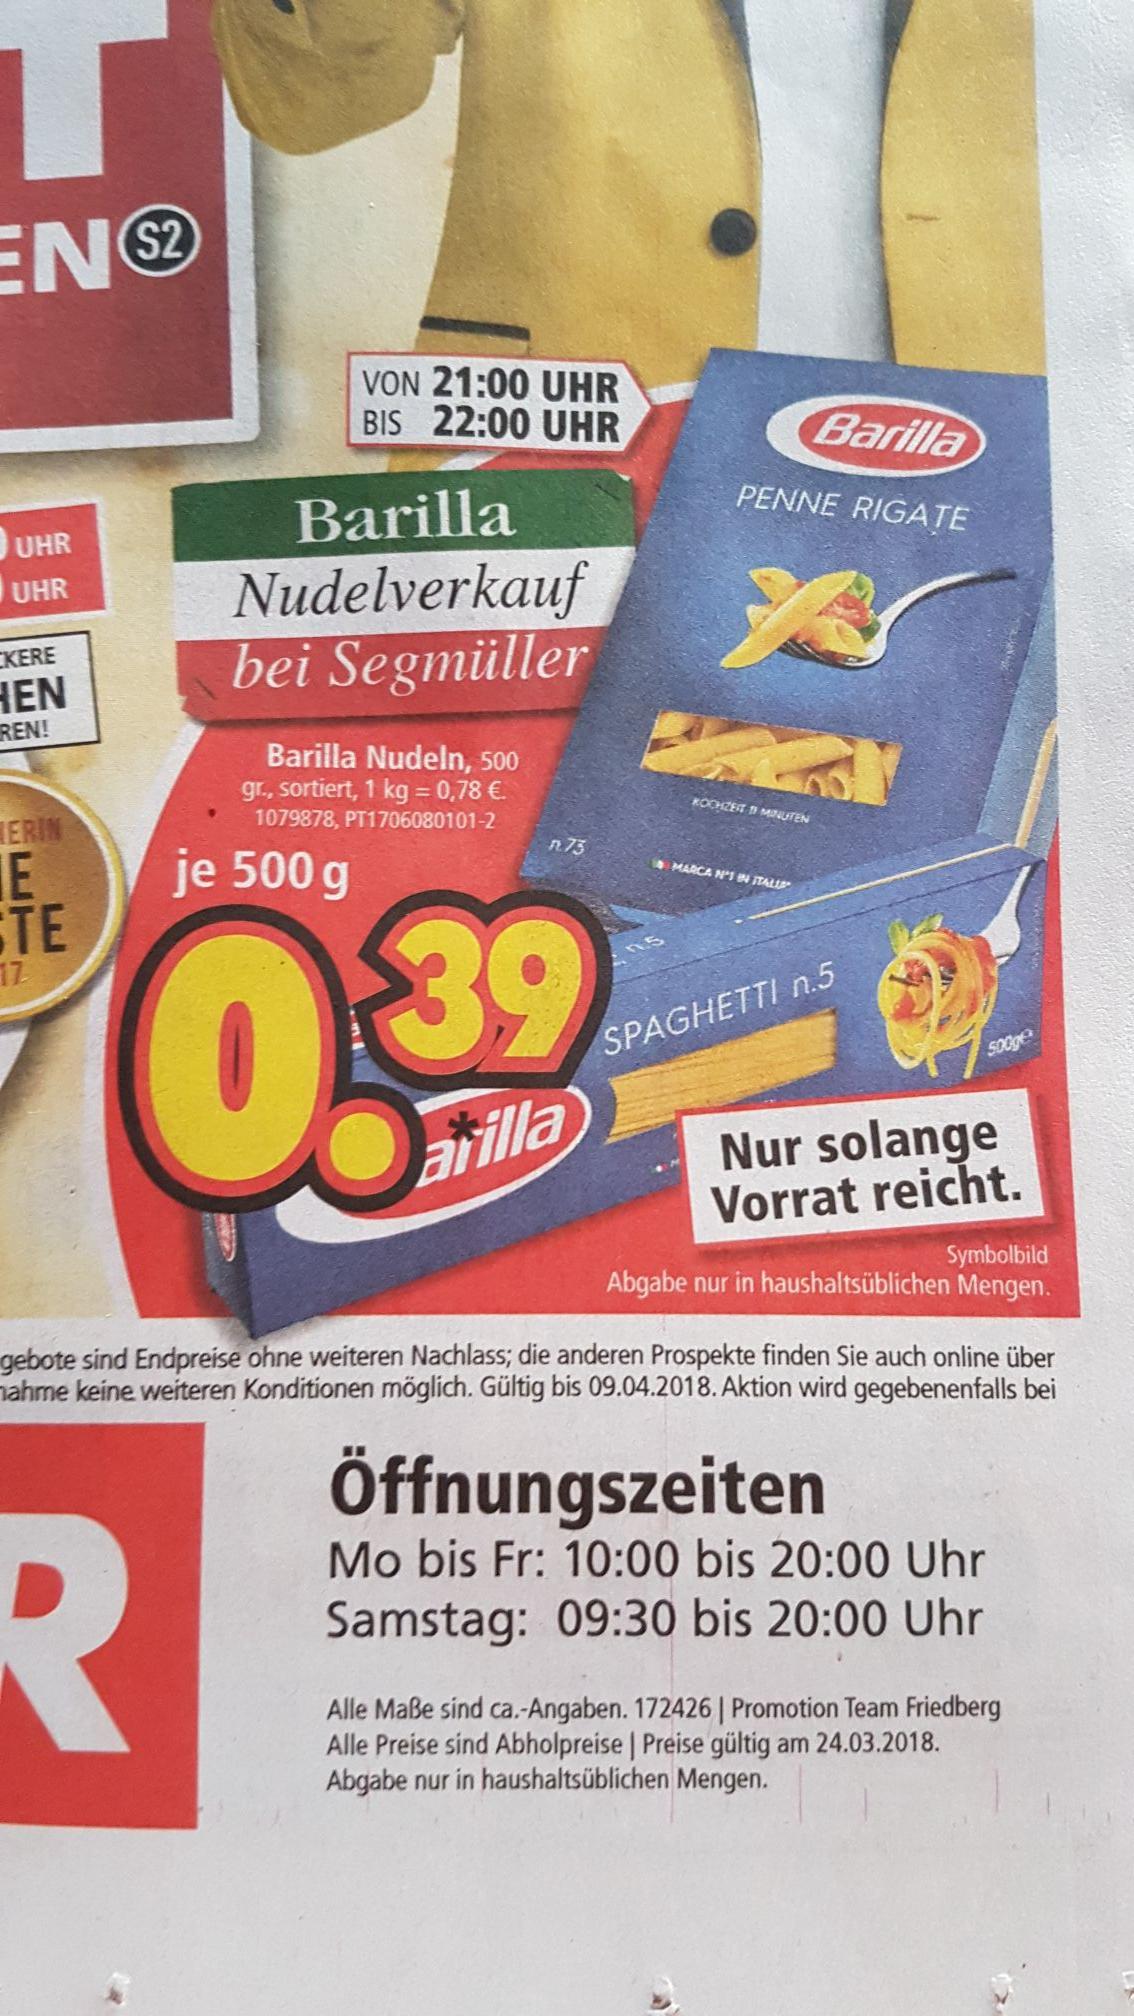 (Lokal) Segmüller Barilla Megatiefpreis (auch Integeale)